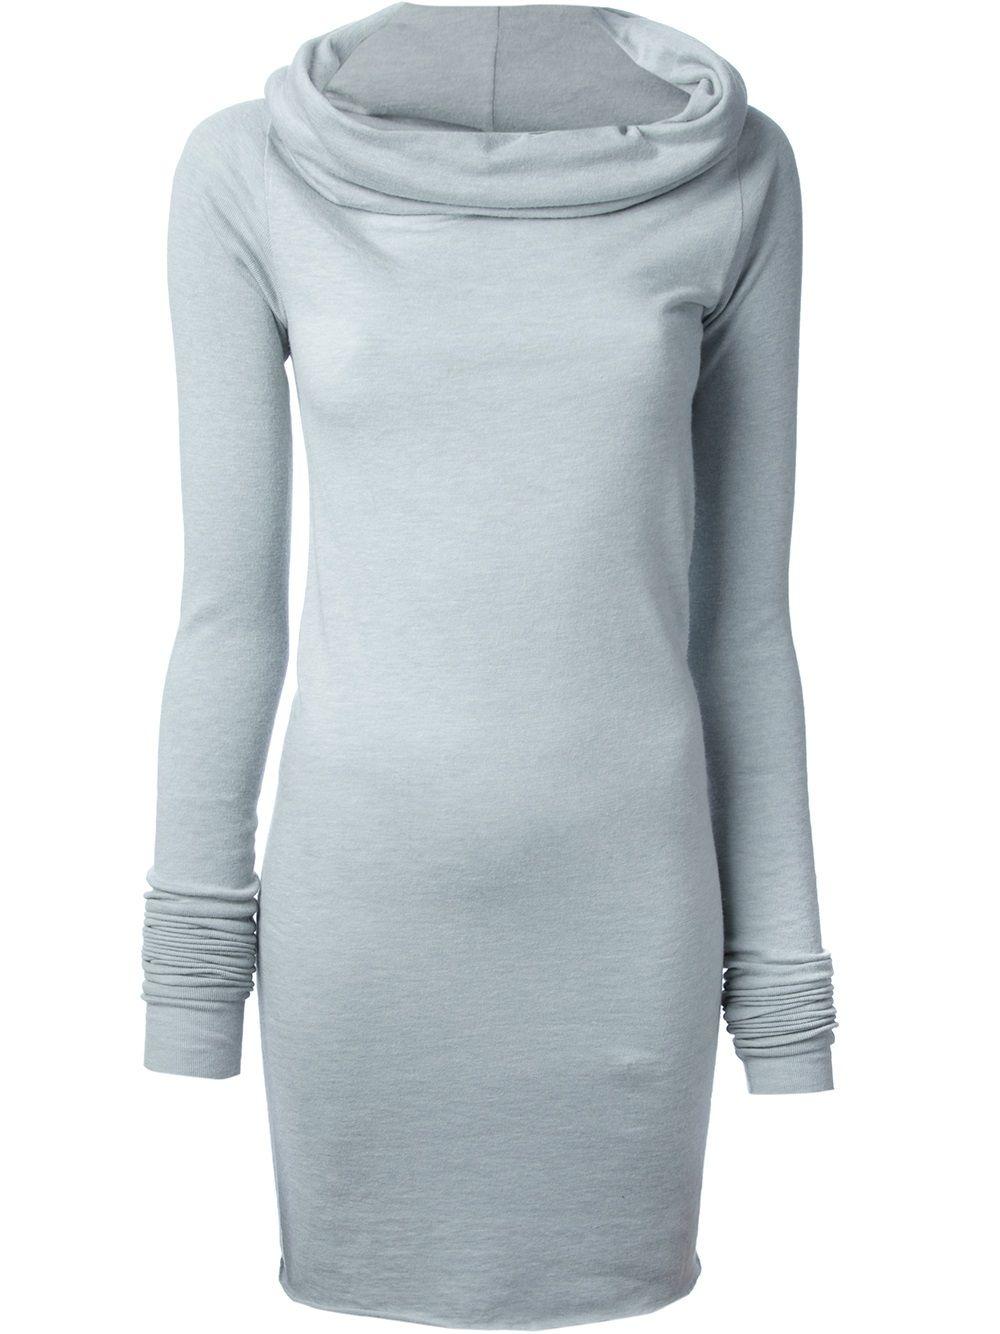 RICK OWENS -  Gray Draped Neck Sweater